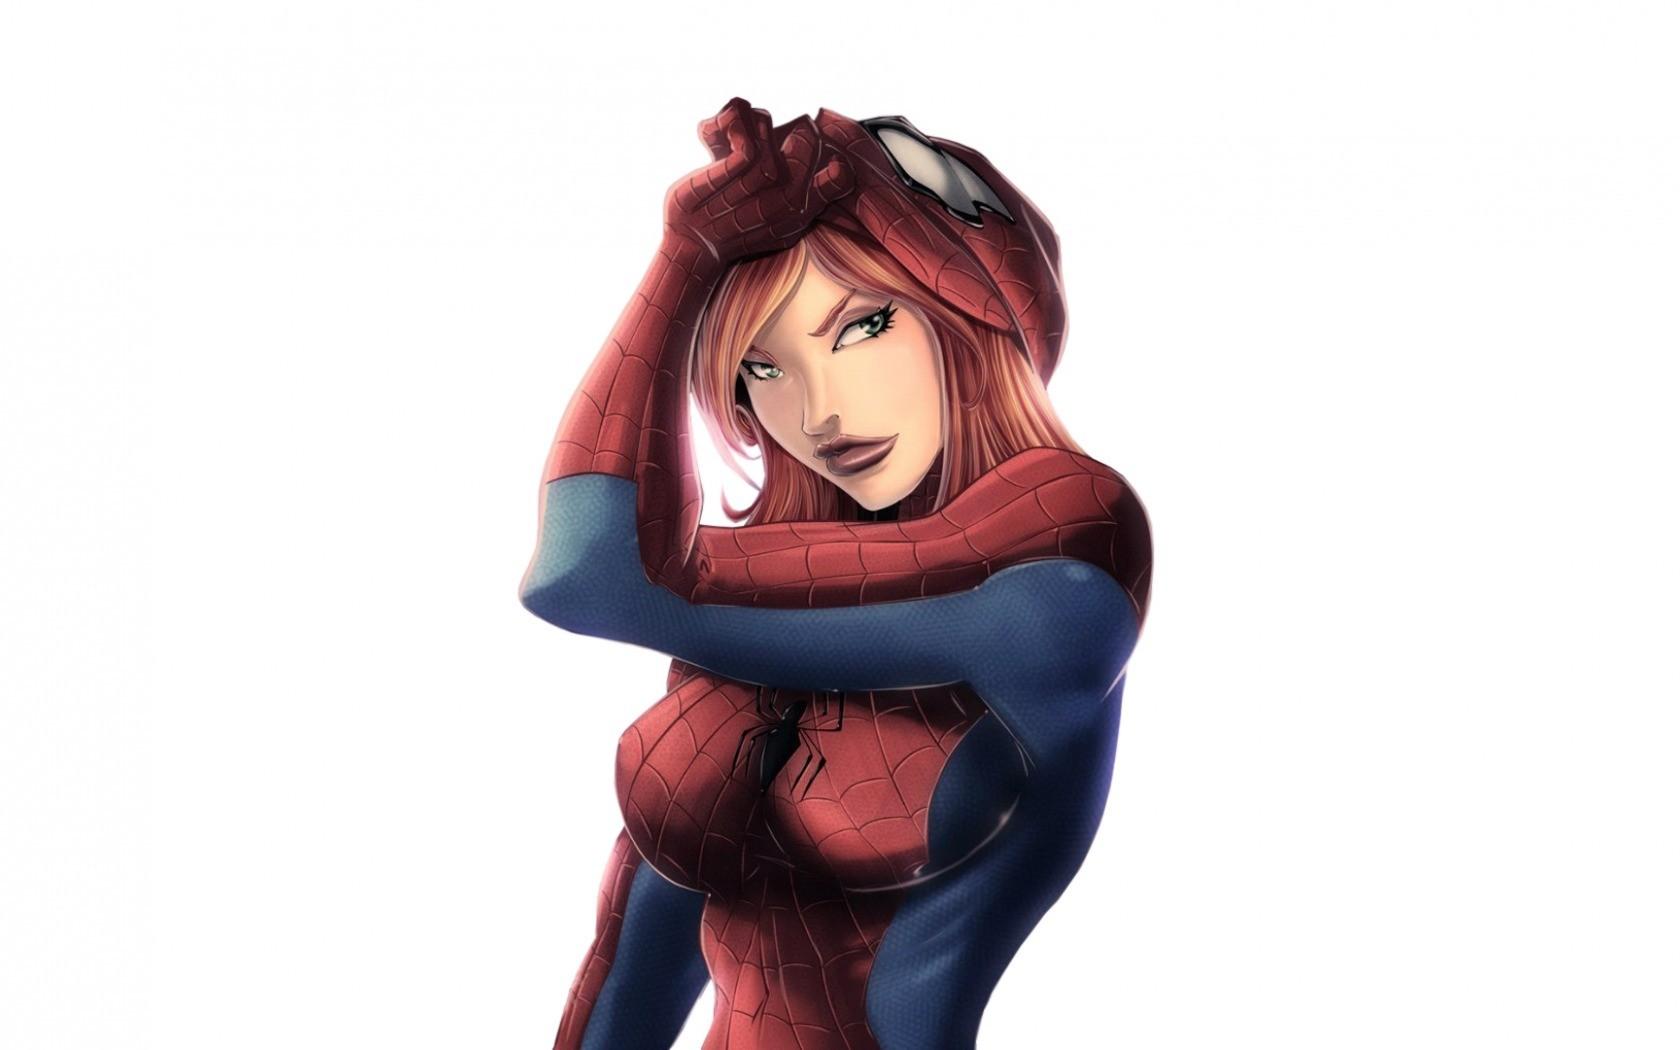 Anime cartoon marvel comics mary jane toy superheroines spider girl figurine action figure